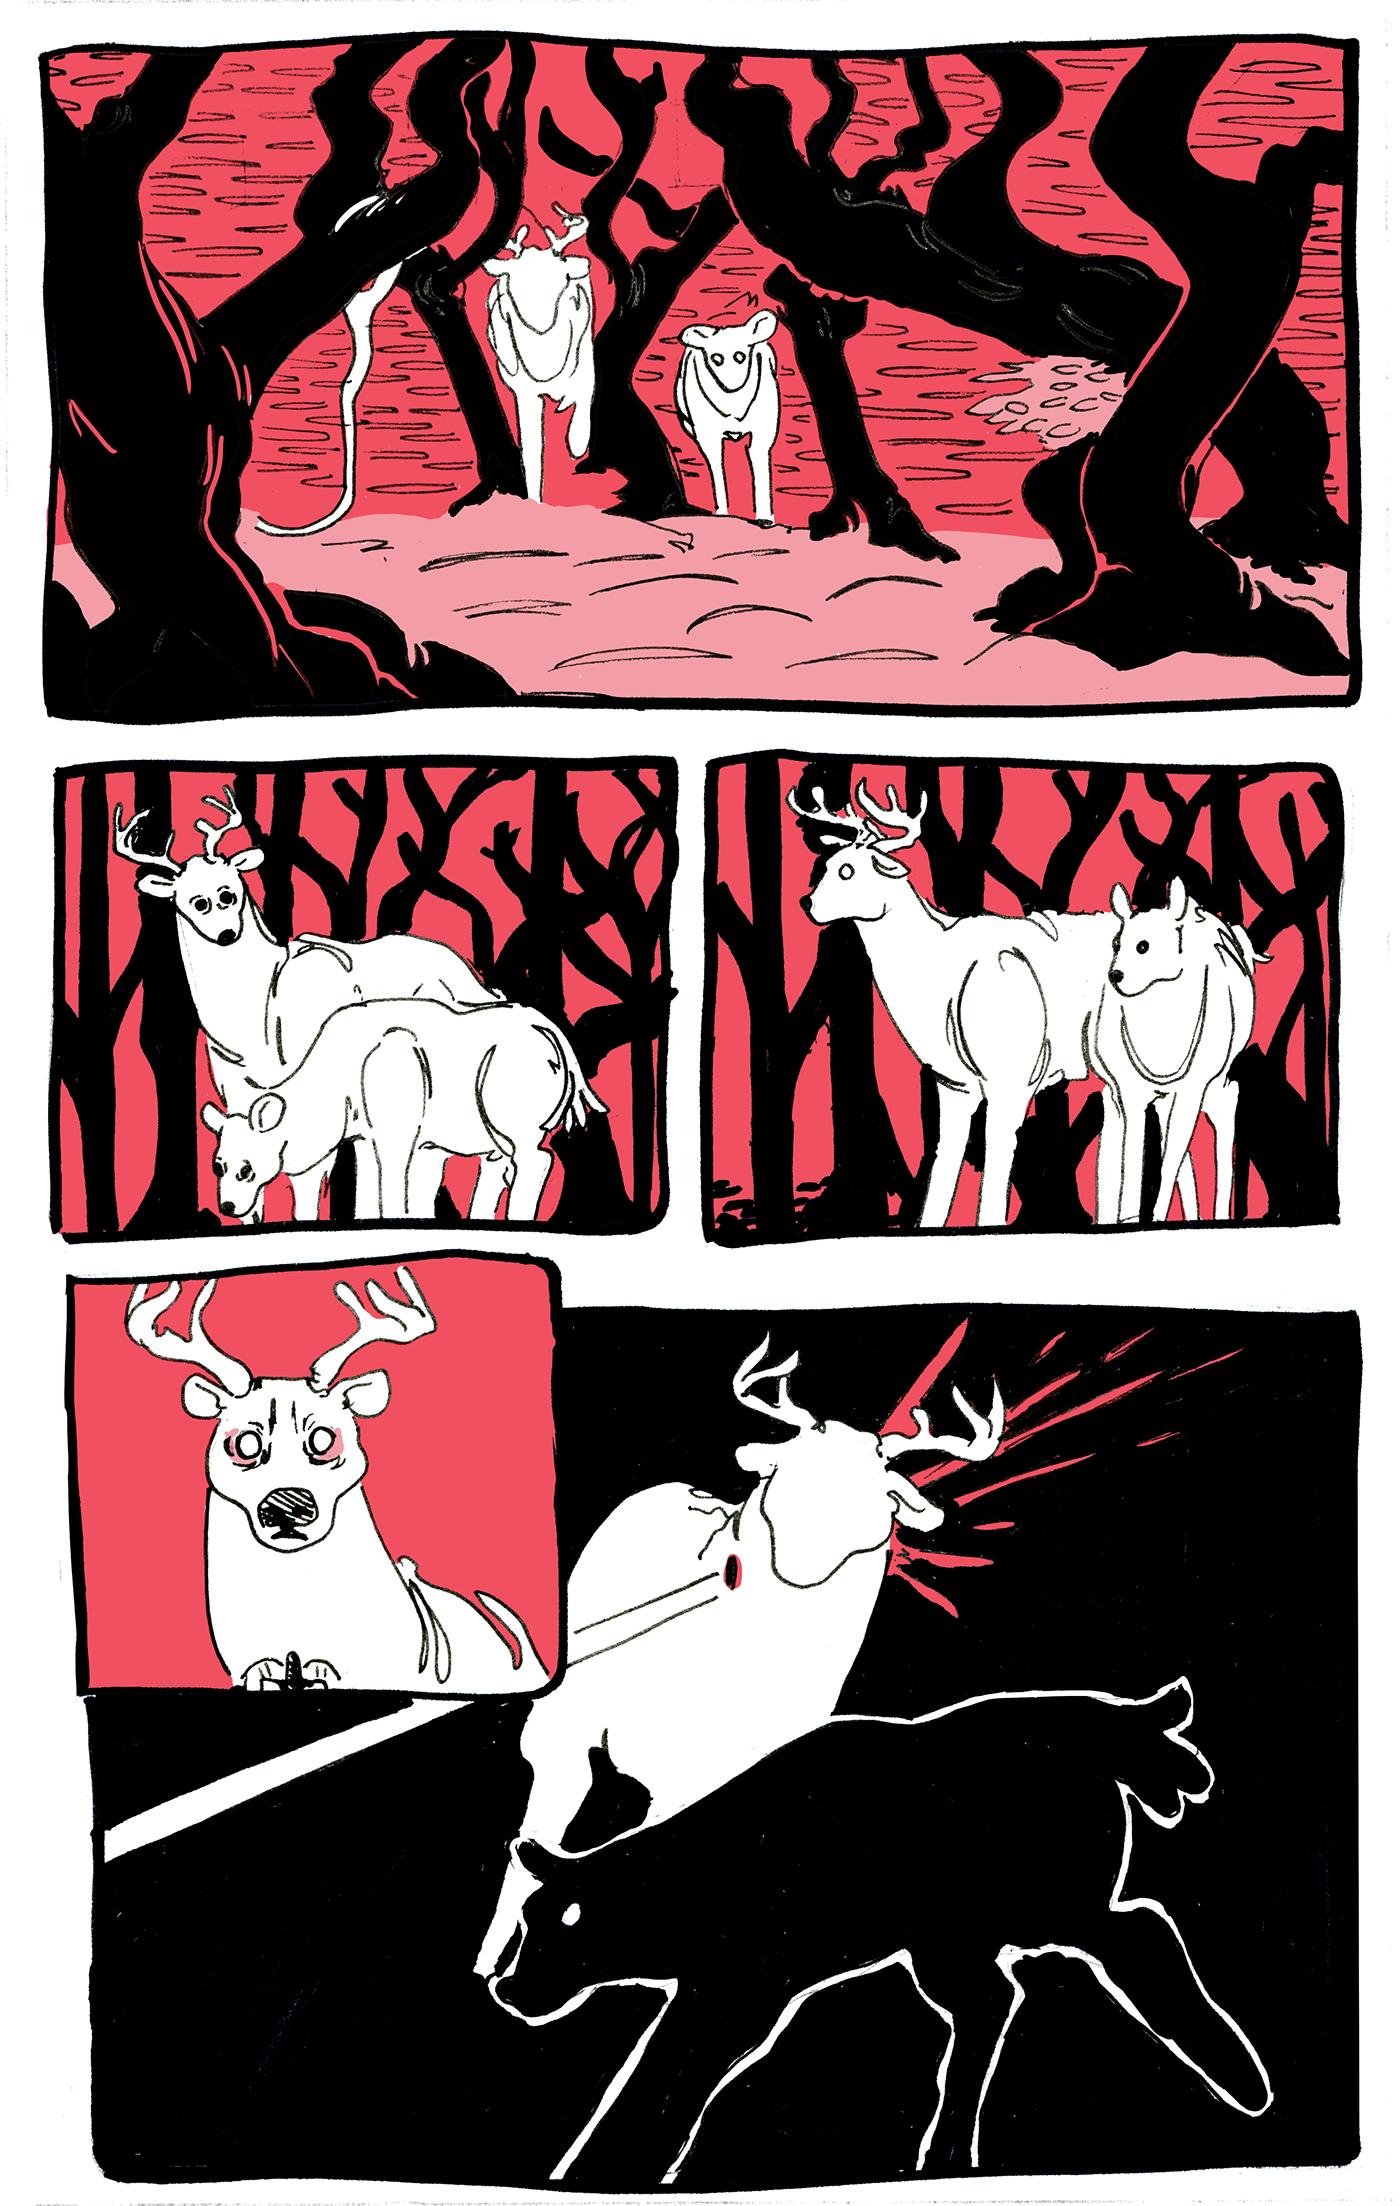 Image may contain: cartoon, book and animal